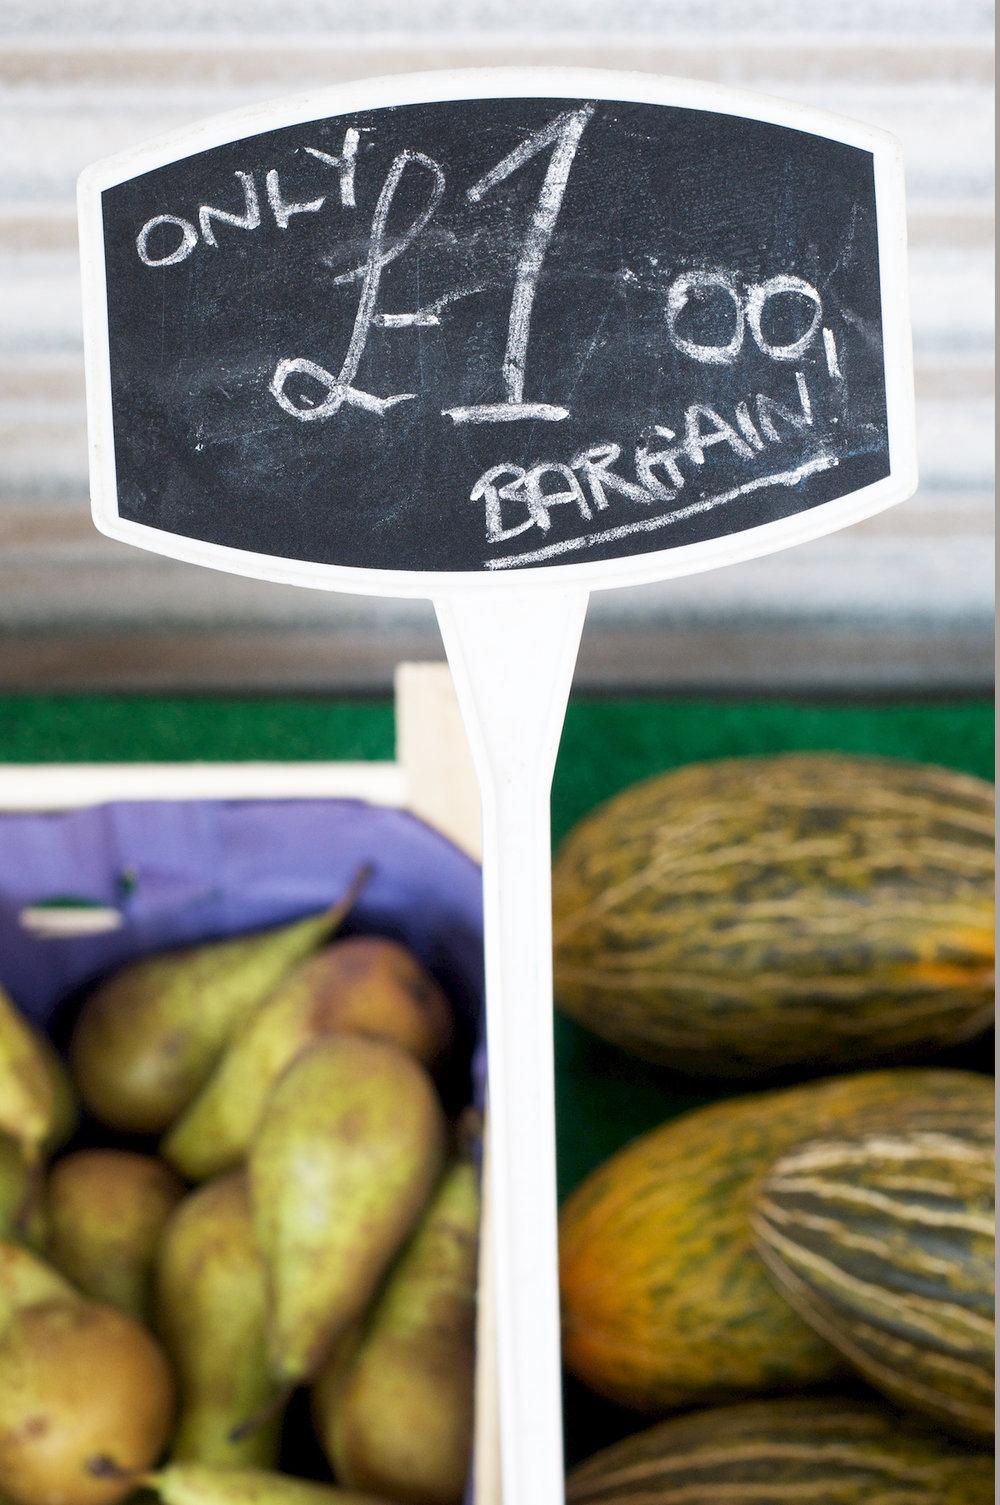 £1-bargain.jpg